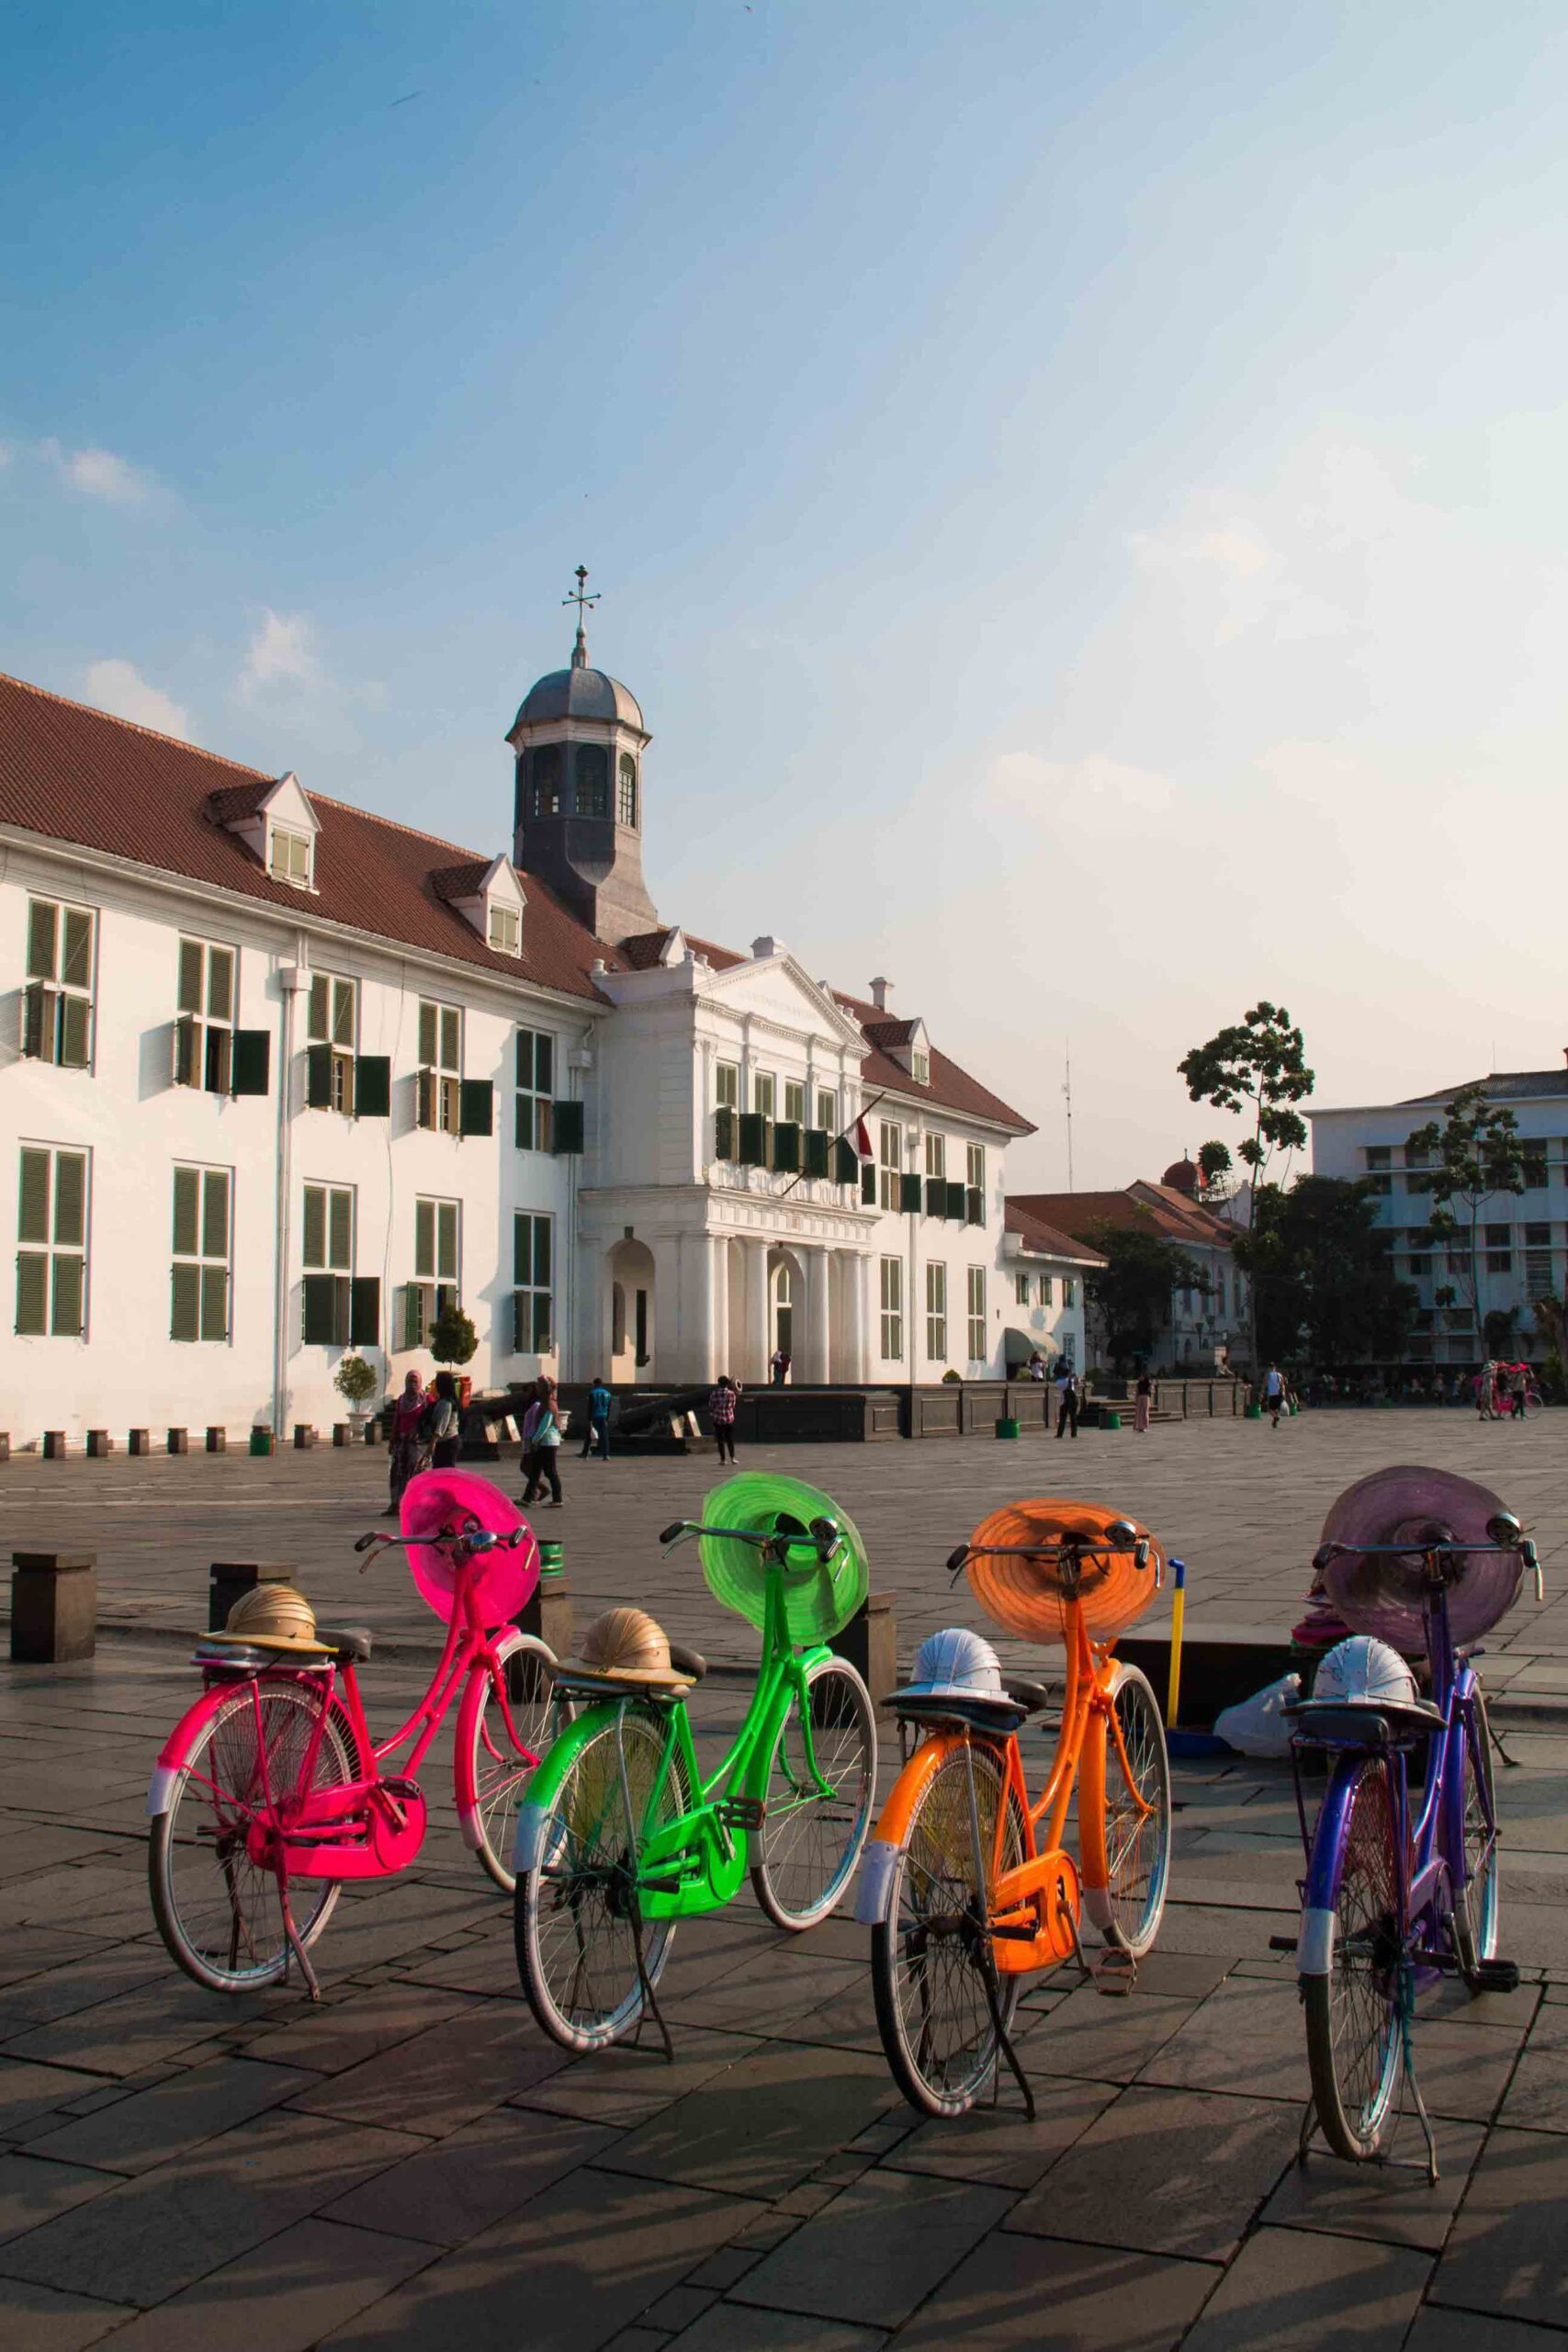 batavia kota square bicycles jakarta